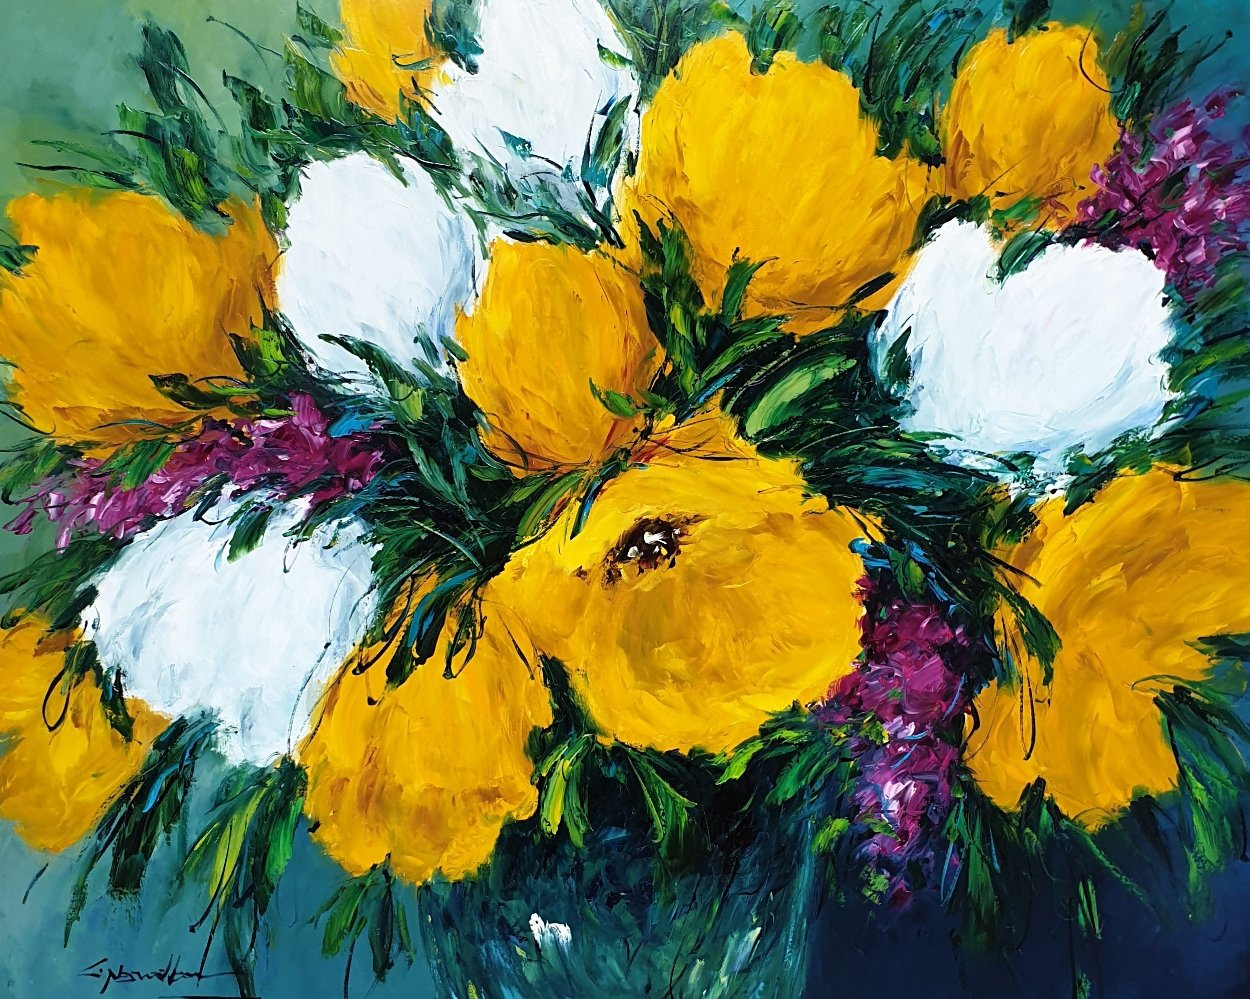 Yellow Bloom 2006 36x44 Super Huge Original Painting by Christian Nesvadba